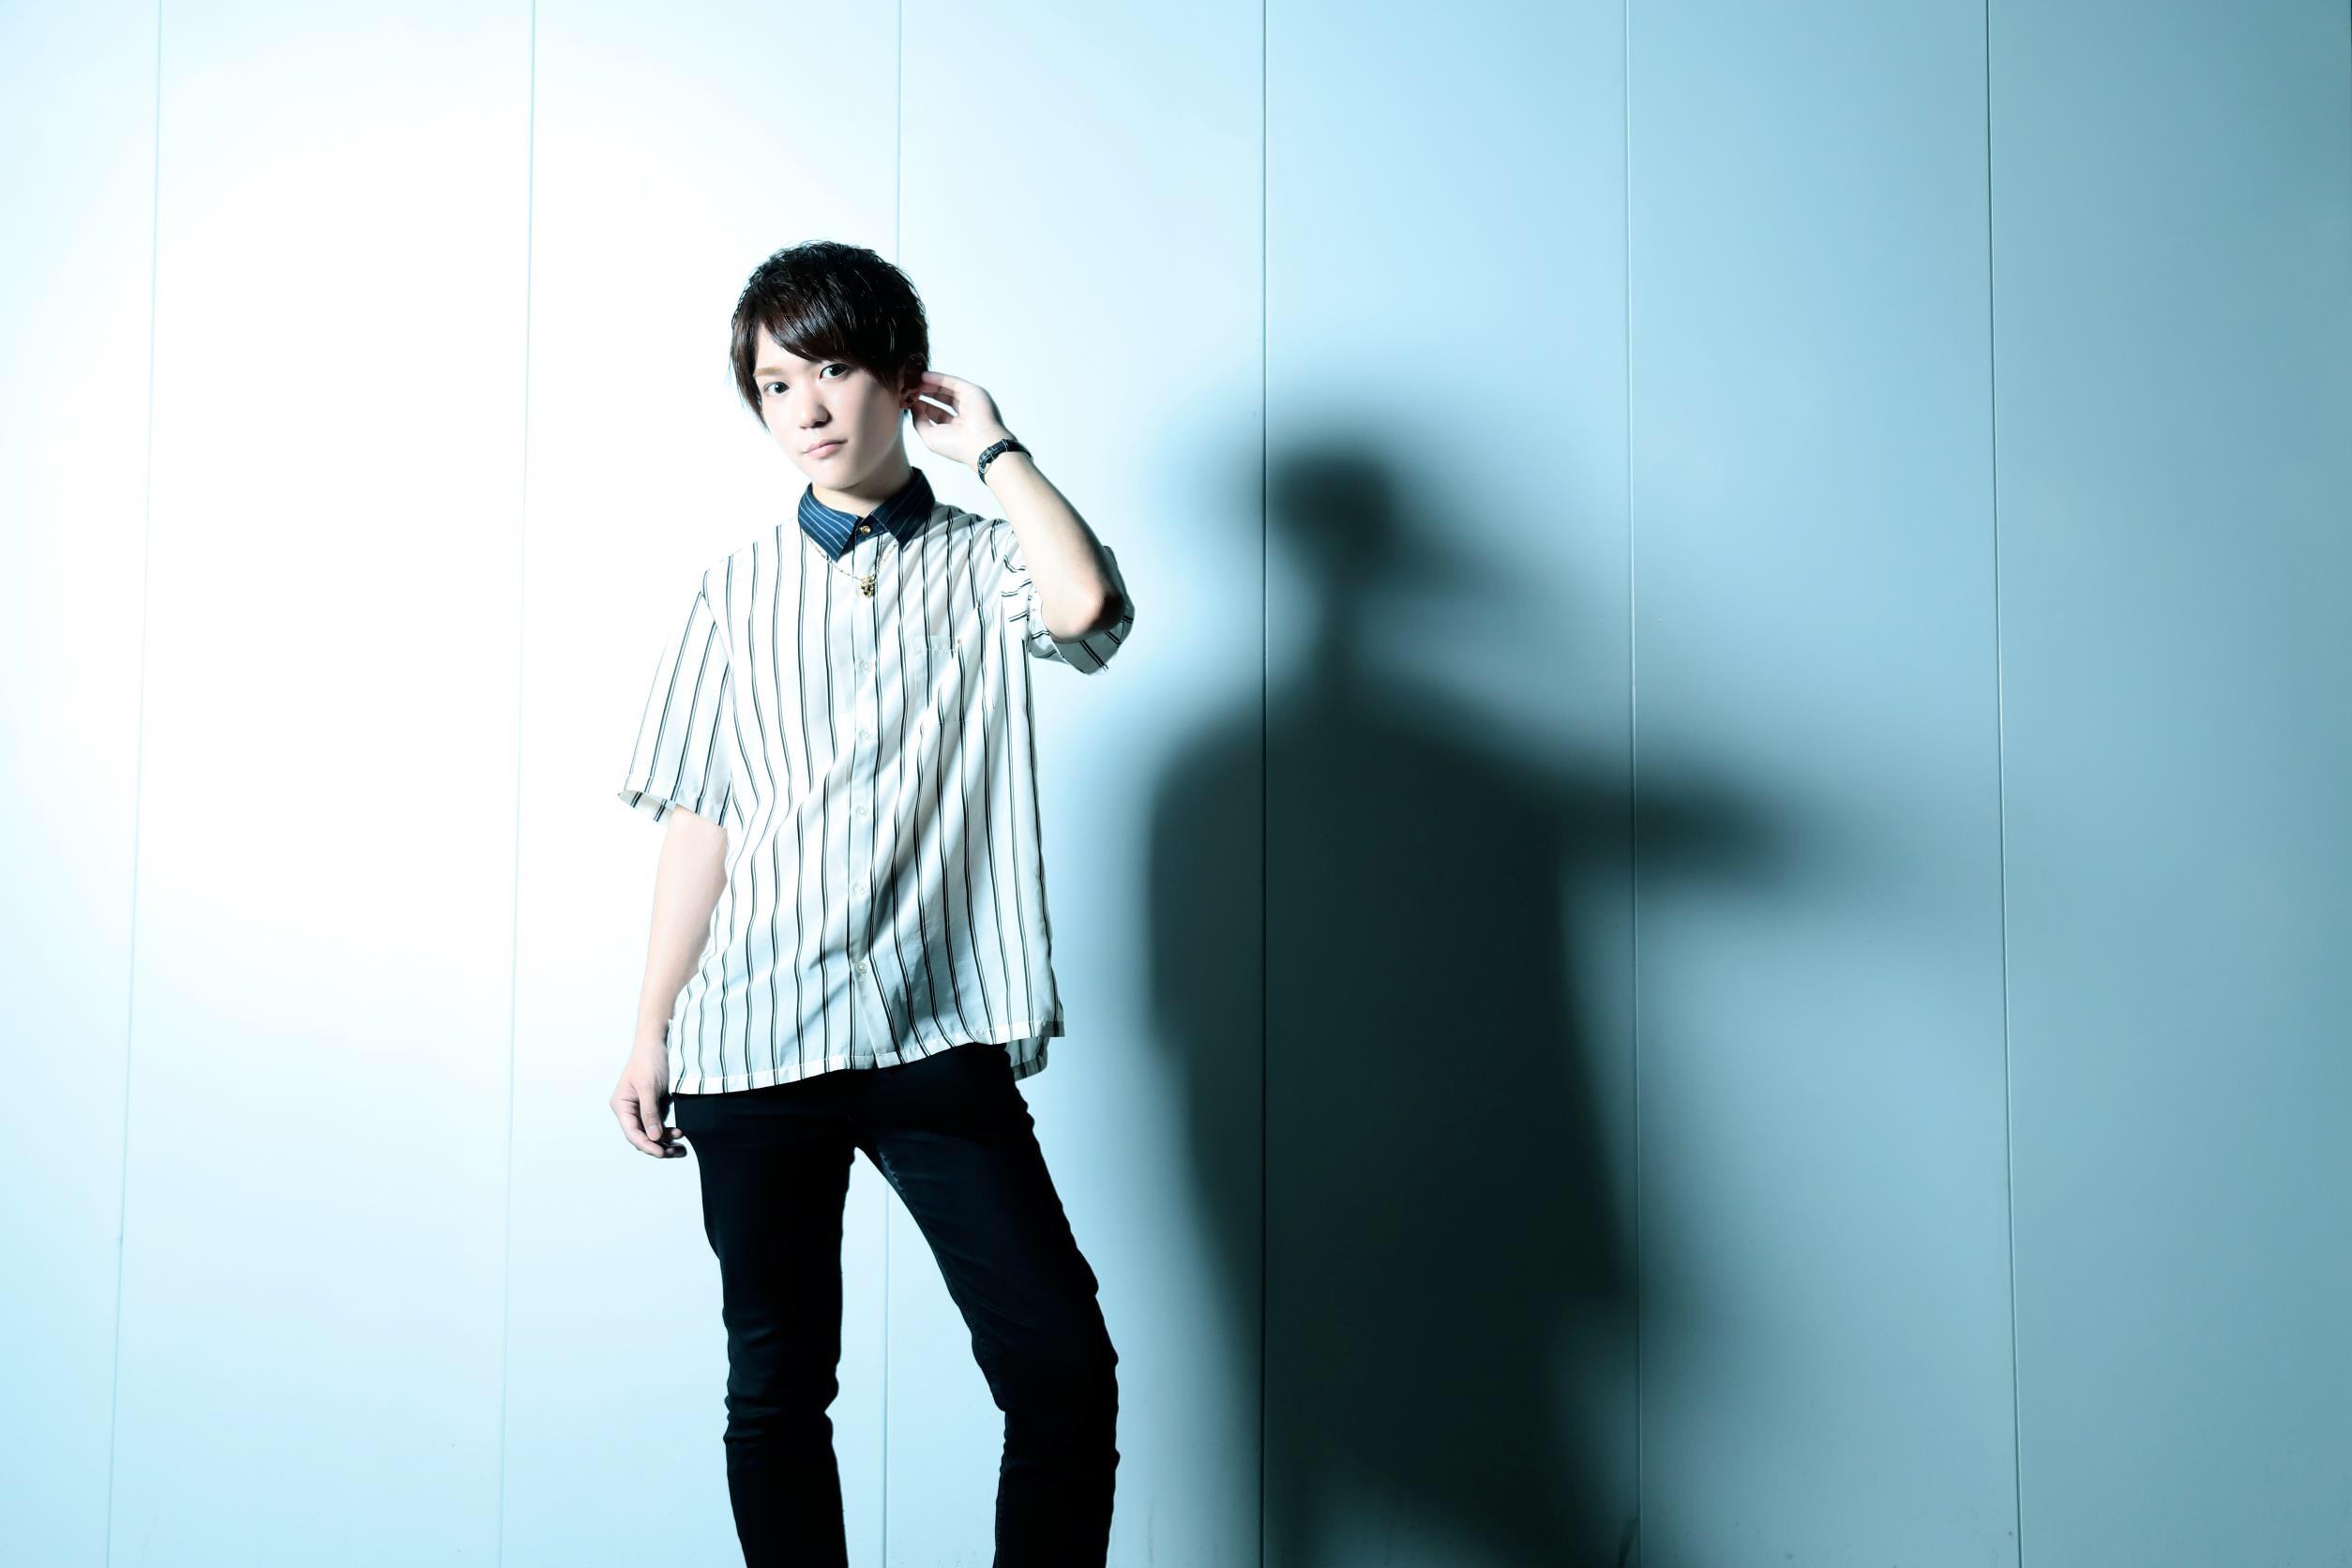 Yu Kirisakiのグラビア画像(2)